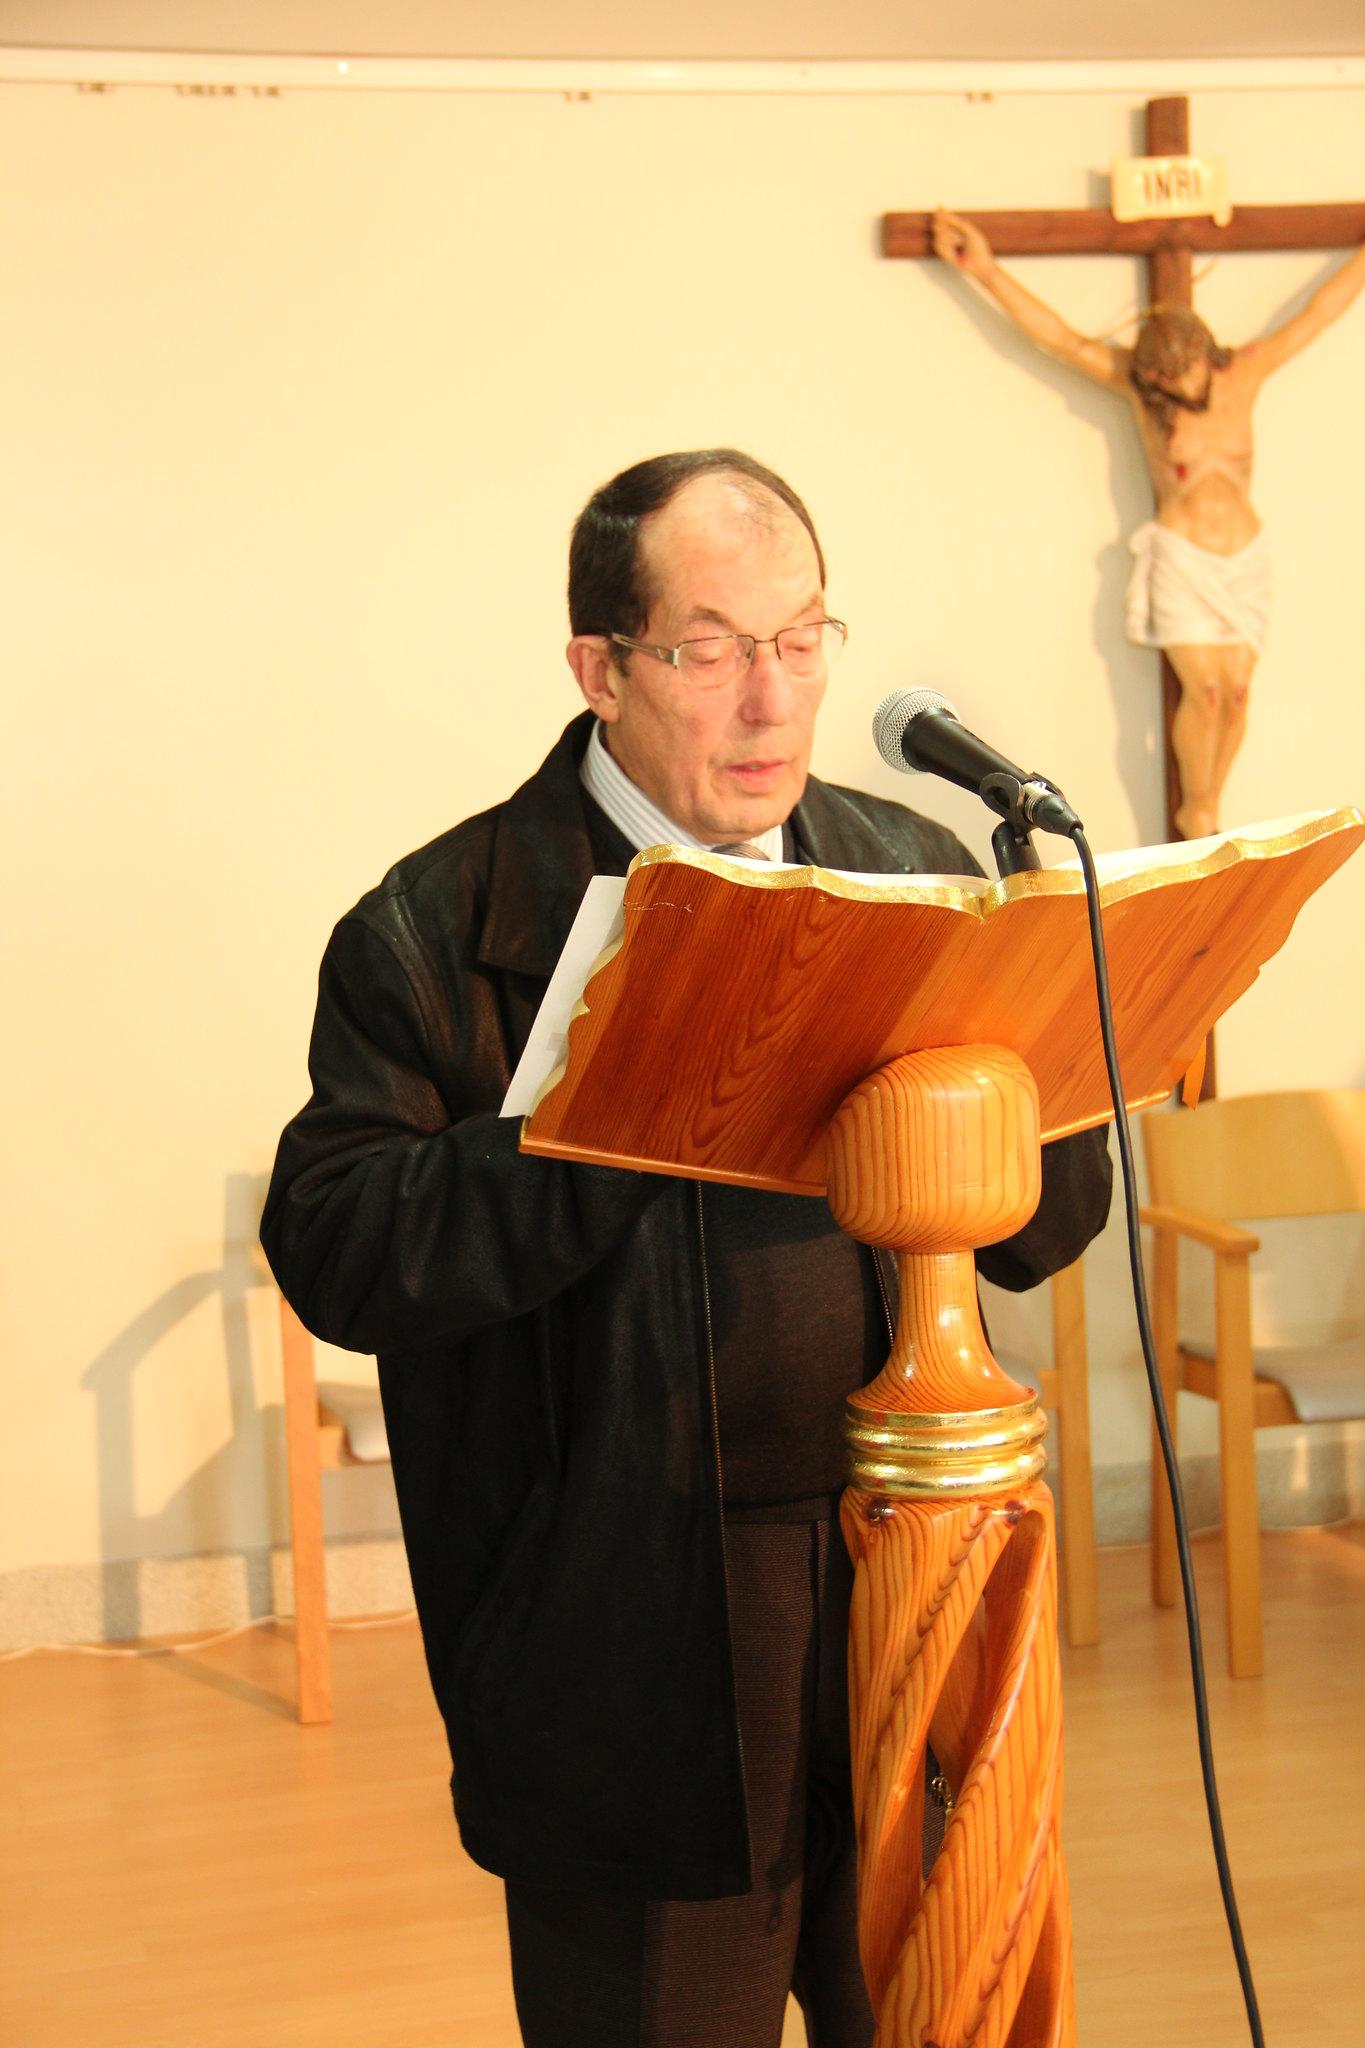 (2016-02-13) - Inauguración Virgen De Lourdes, La Molineta - Archivo La Molineta (053)